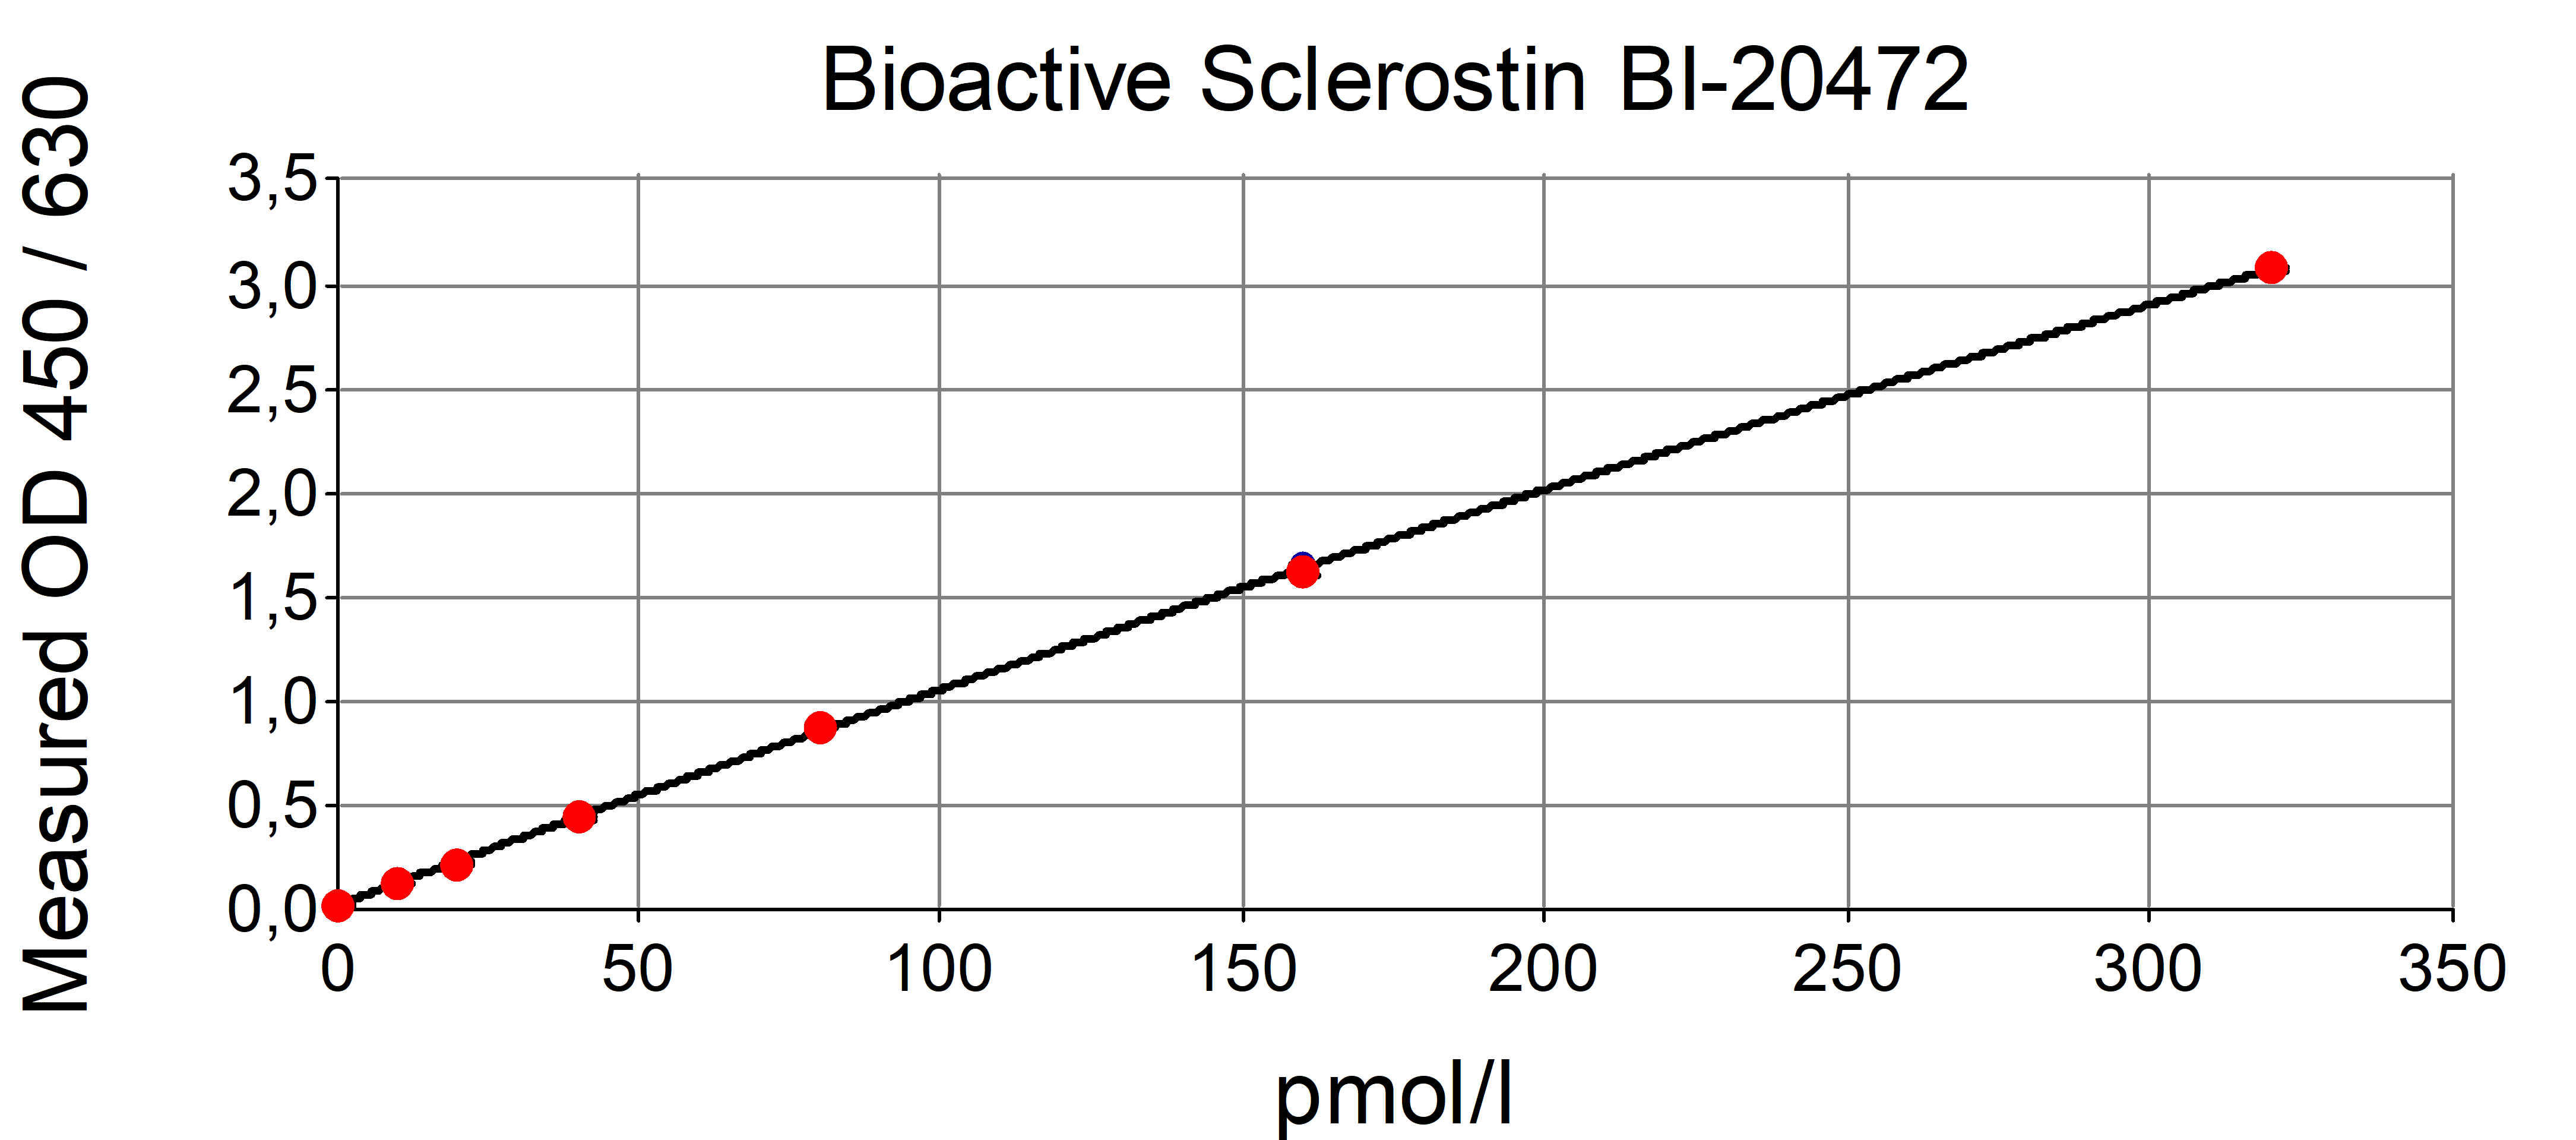 bioactive Sclerostin ELISA Typical standard curve